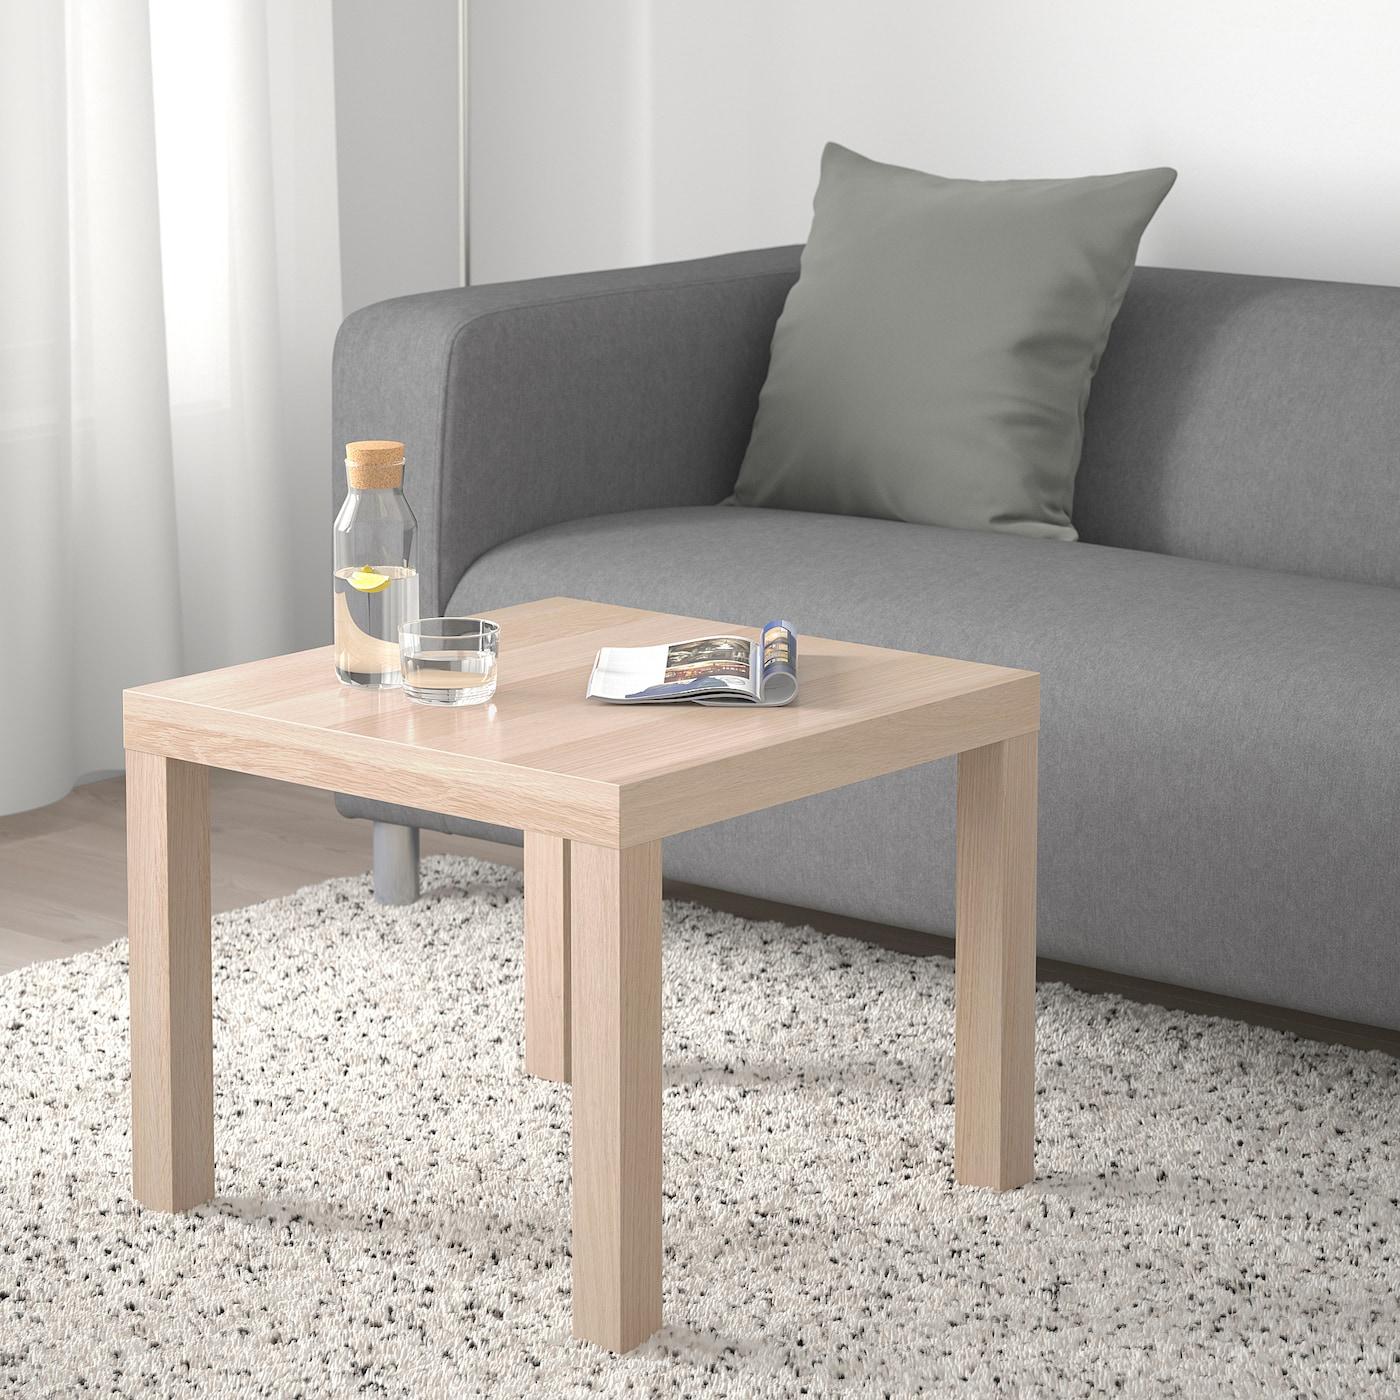 Lack Odkladaci Stolek Vz Bile Mor Dub Bila 55x55 Cm Ikea [ 1400 x 1400 Pixel ]